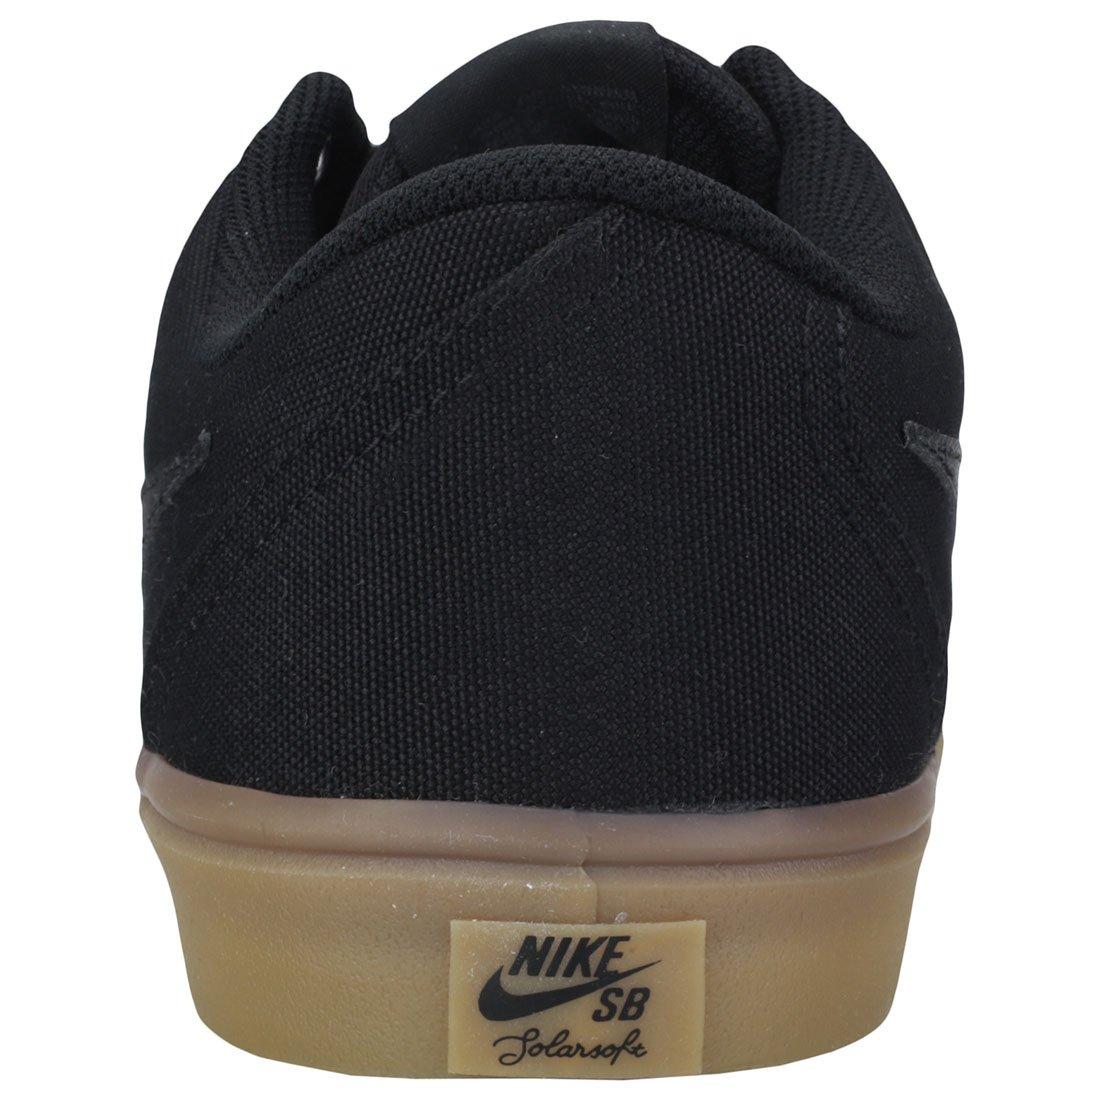 Nike Men's SB Check Solarsoft Canvas Skateboarding Shoes Black/Black-Gum Light Brown 10 by Nike (Image #4)